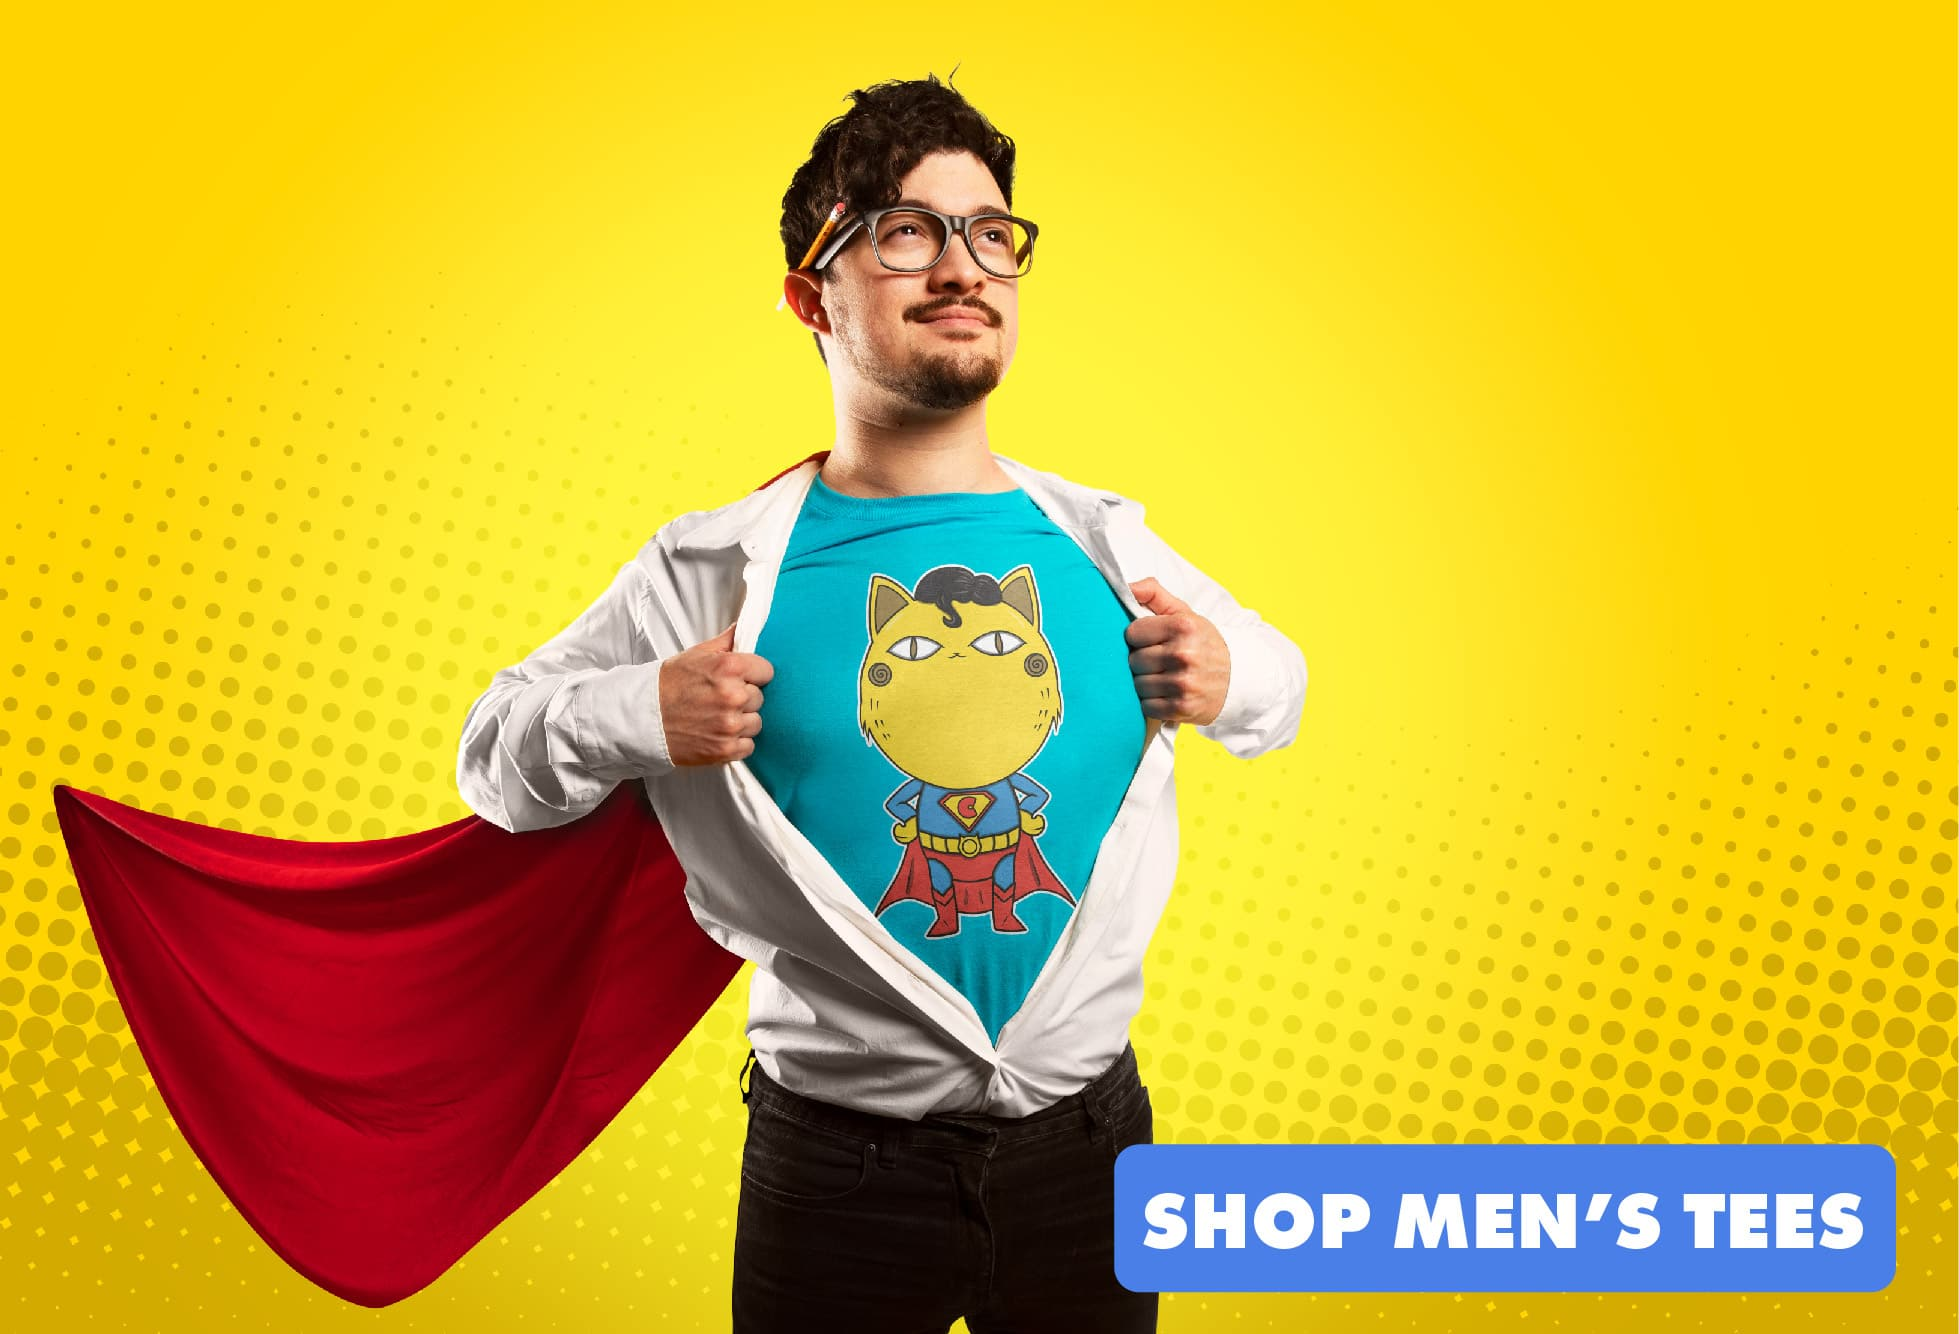 24 Hour Flash Sale - $10 Men's Tees